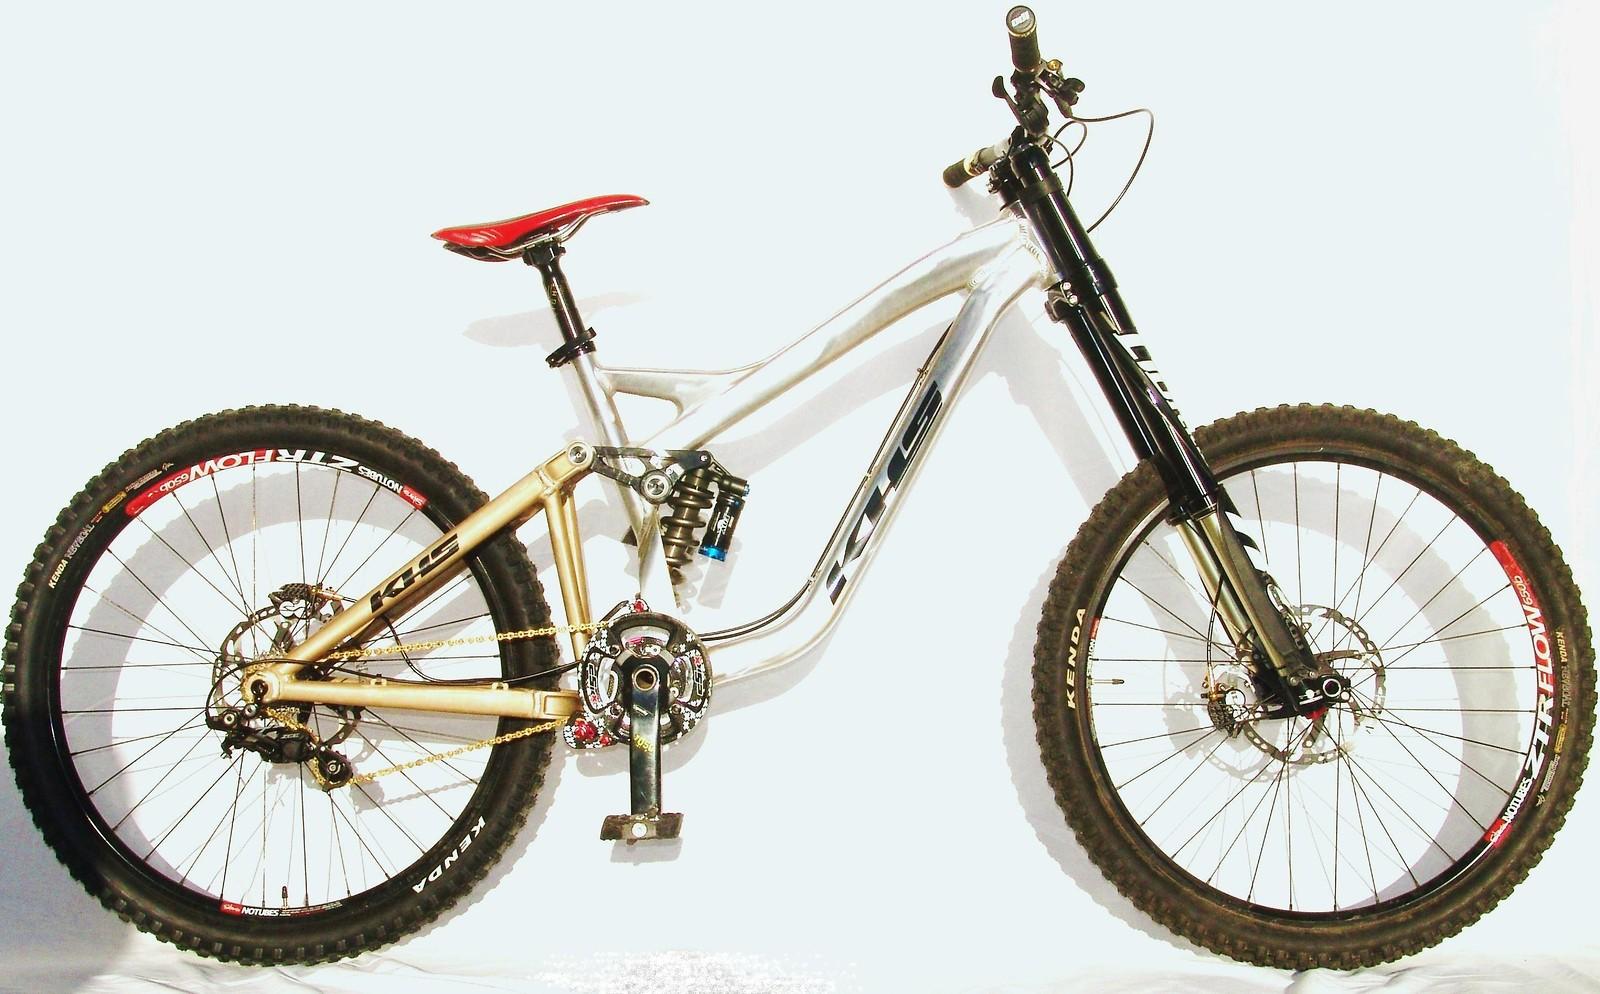 Spy Shot: KHS DH650B Prototype - KHSFactoryRacing - Mountain Biking Pictures - Vital MTB